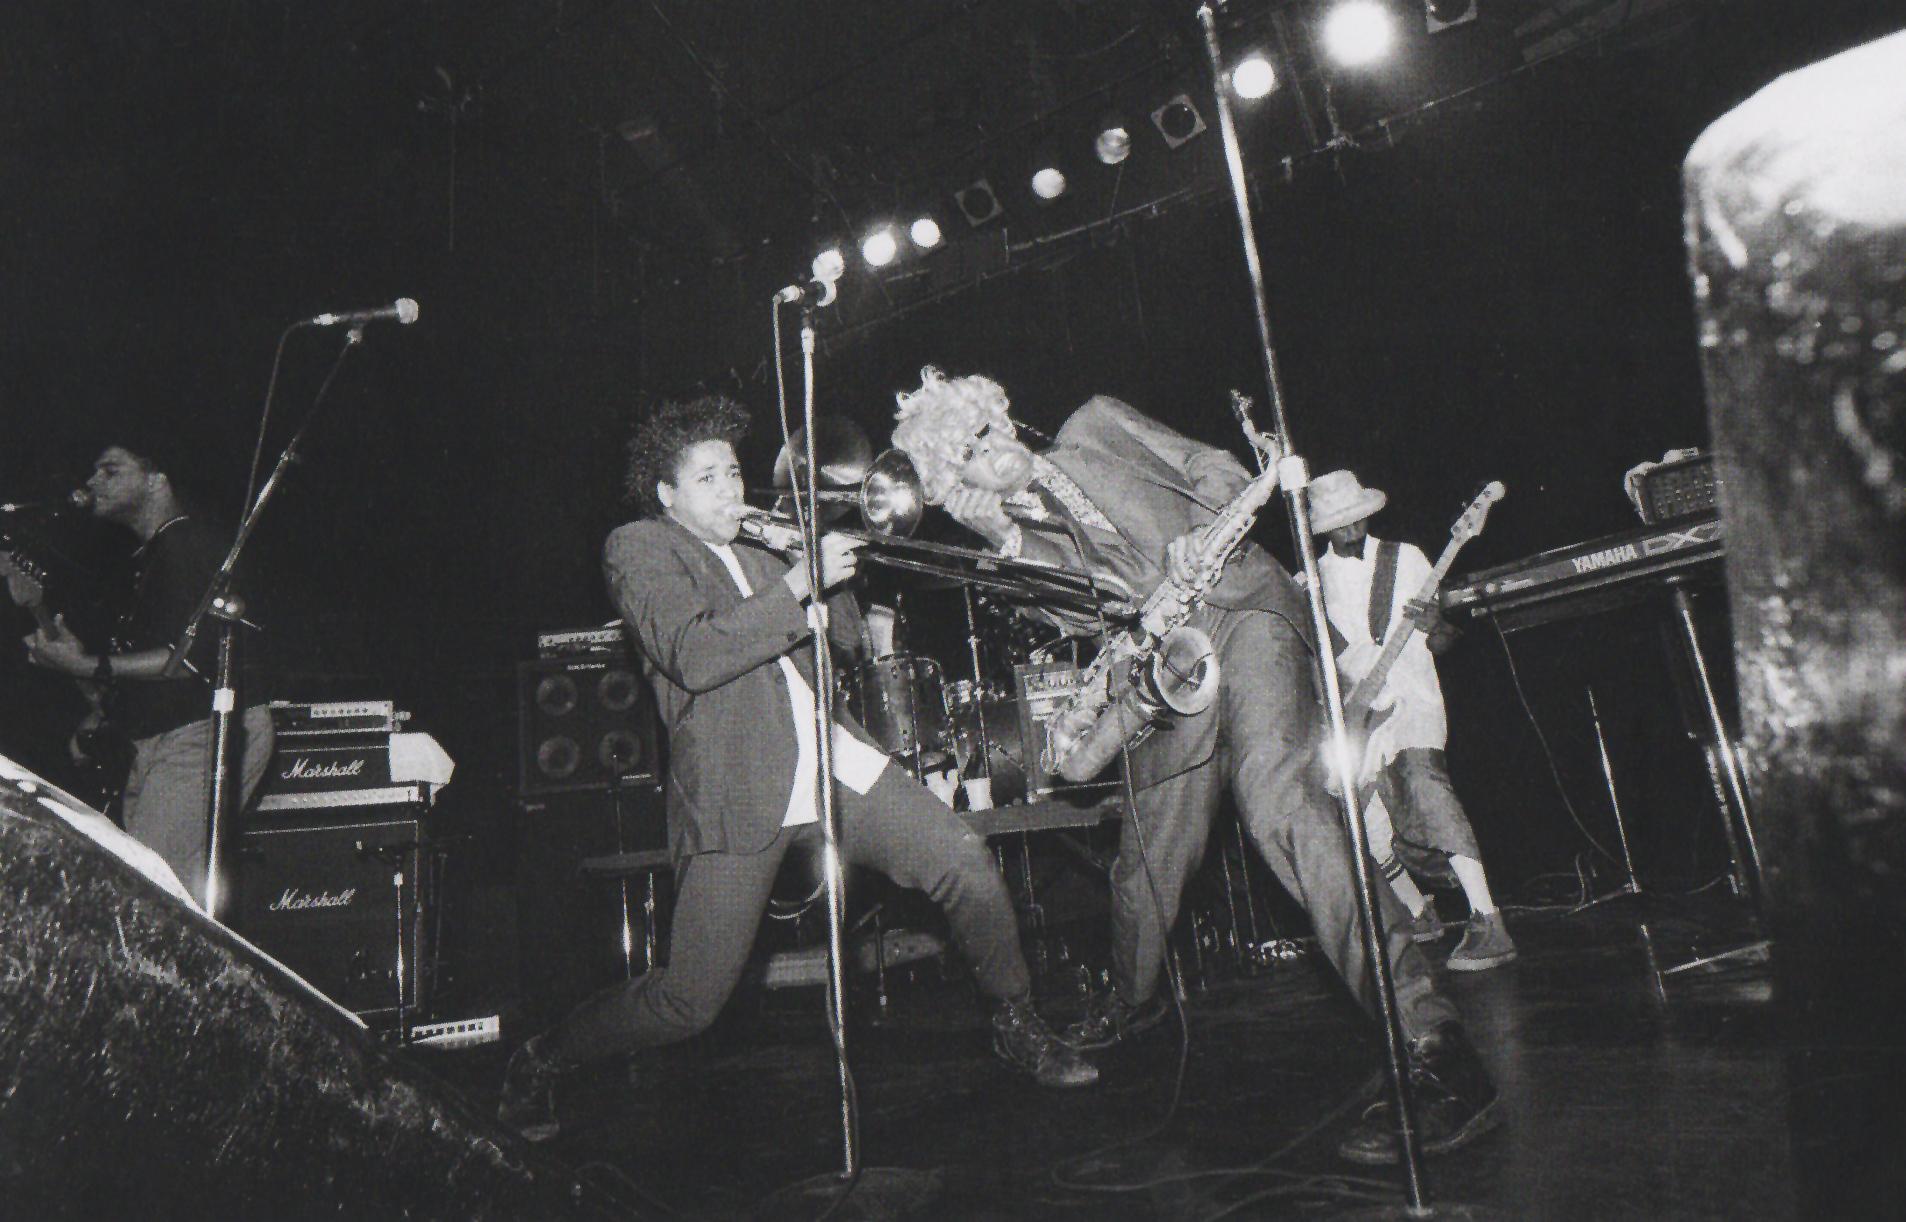 Fishbone at First Avenue, 1986. Photo by Daniel Corrigan.